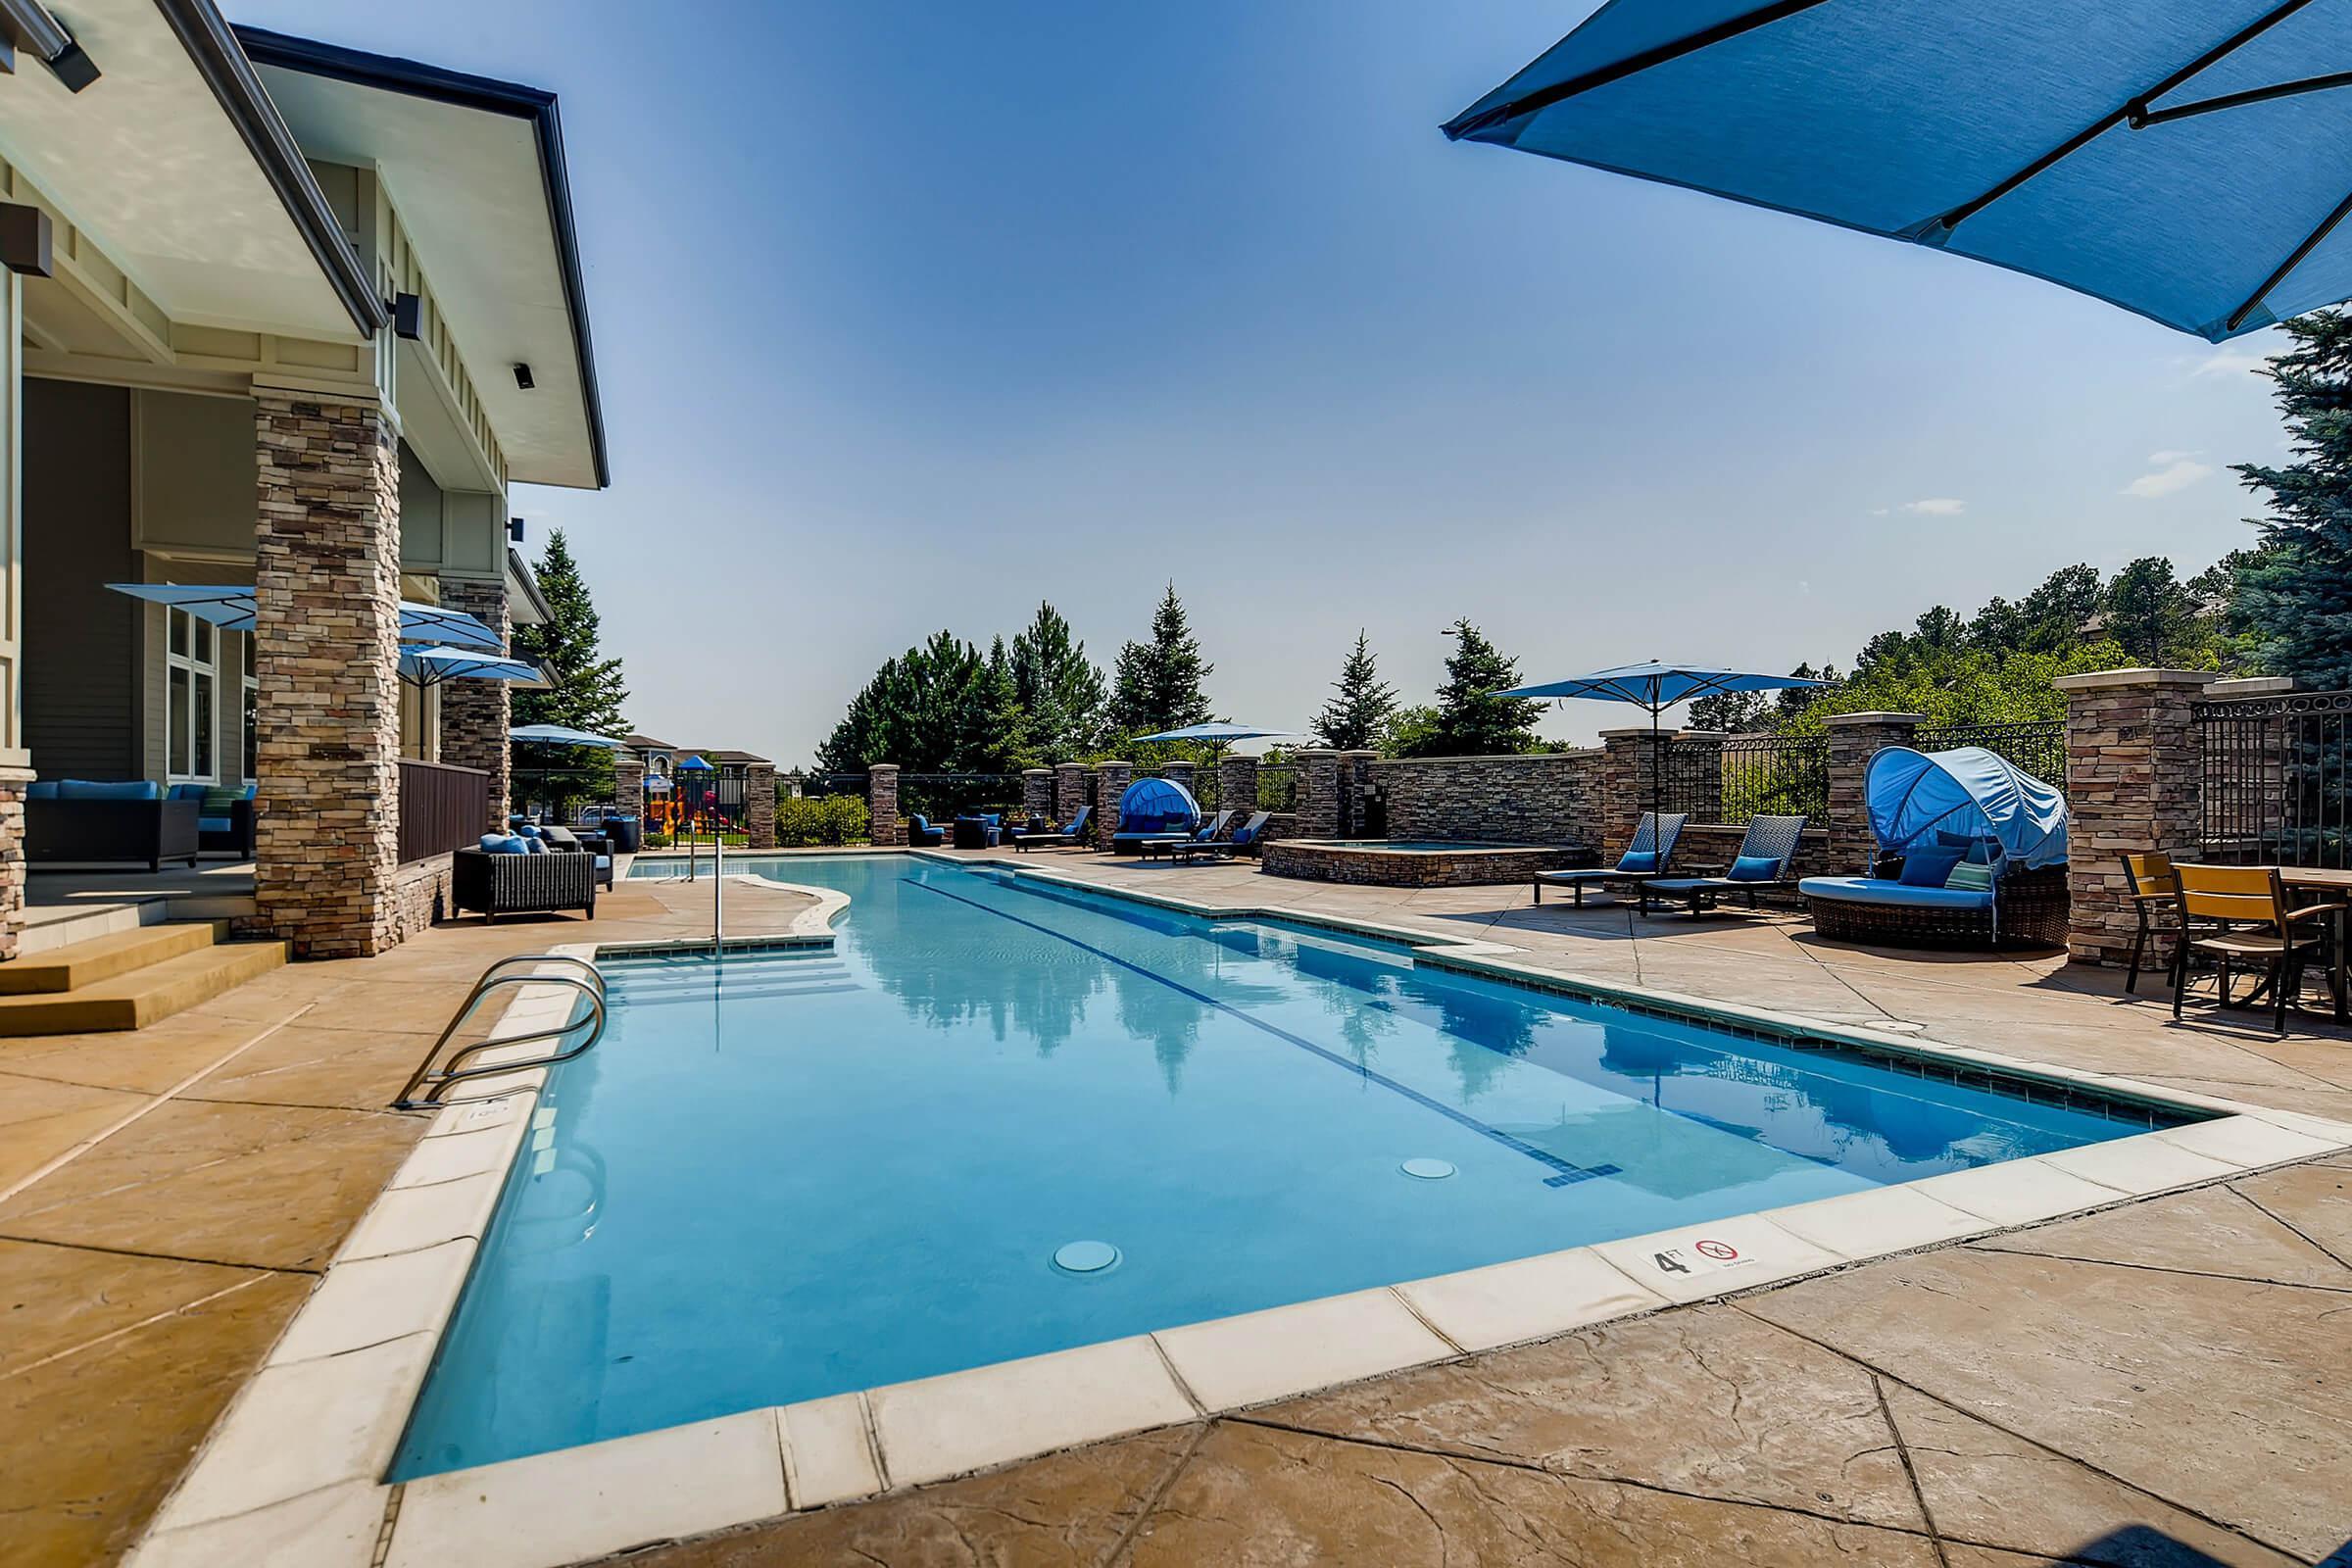 a pool with a blue umbrella